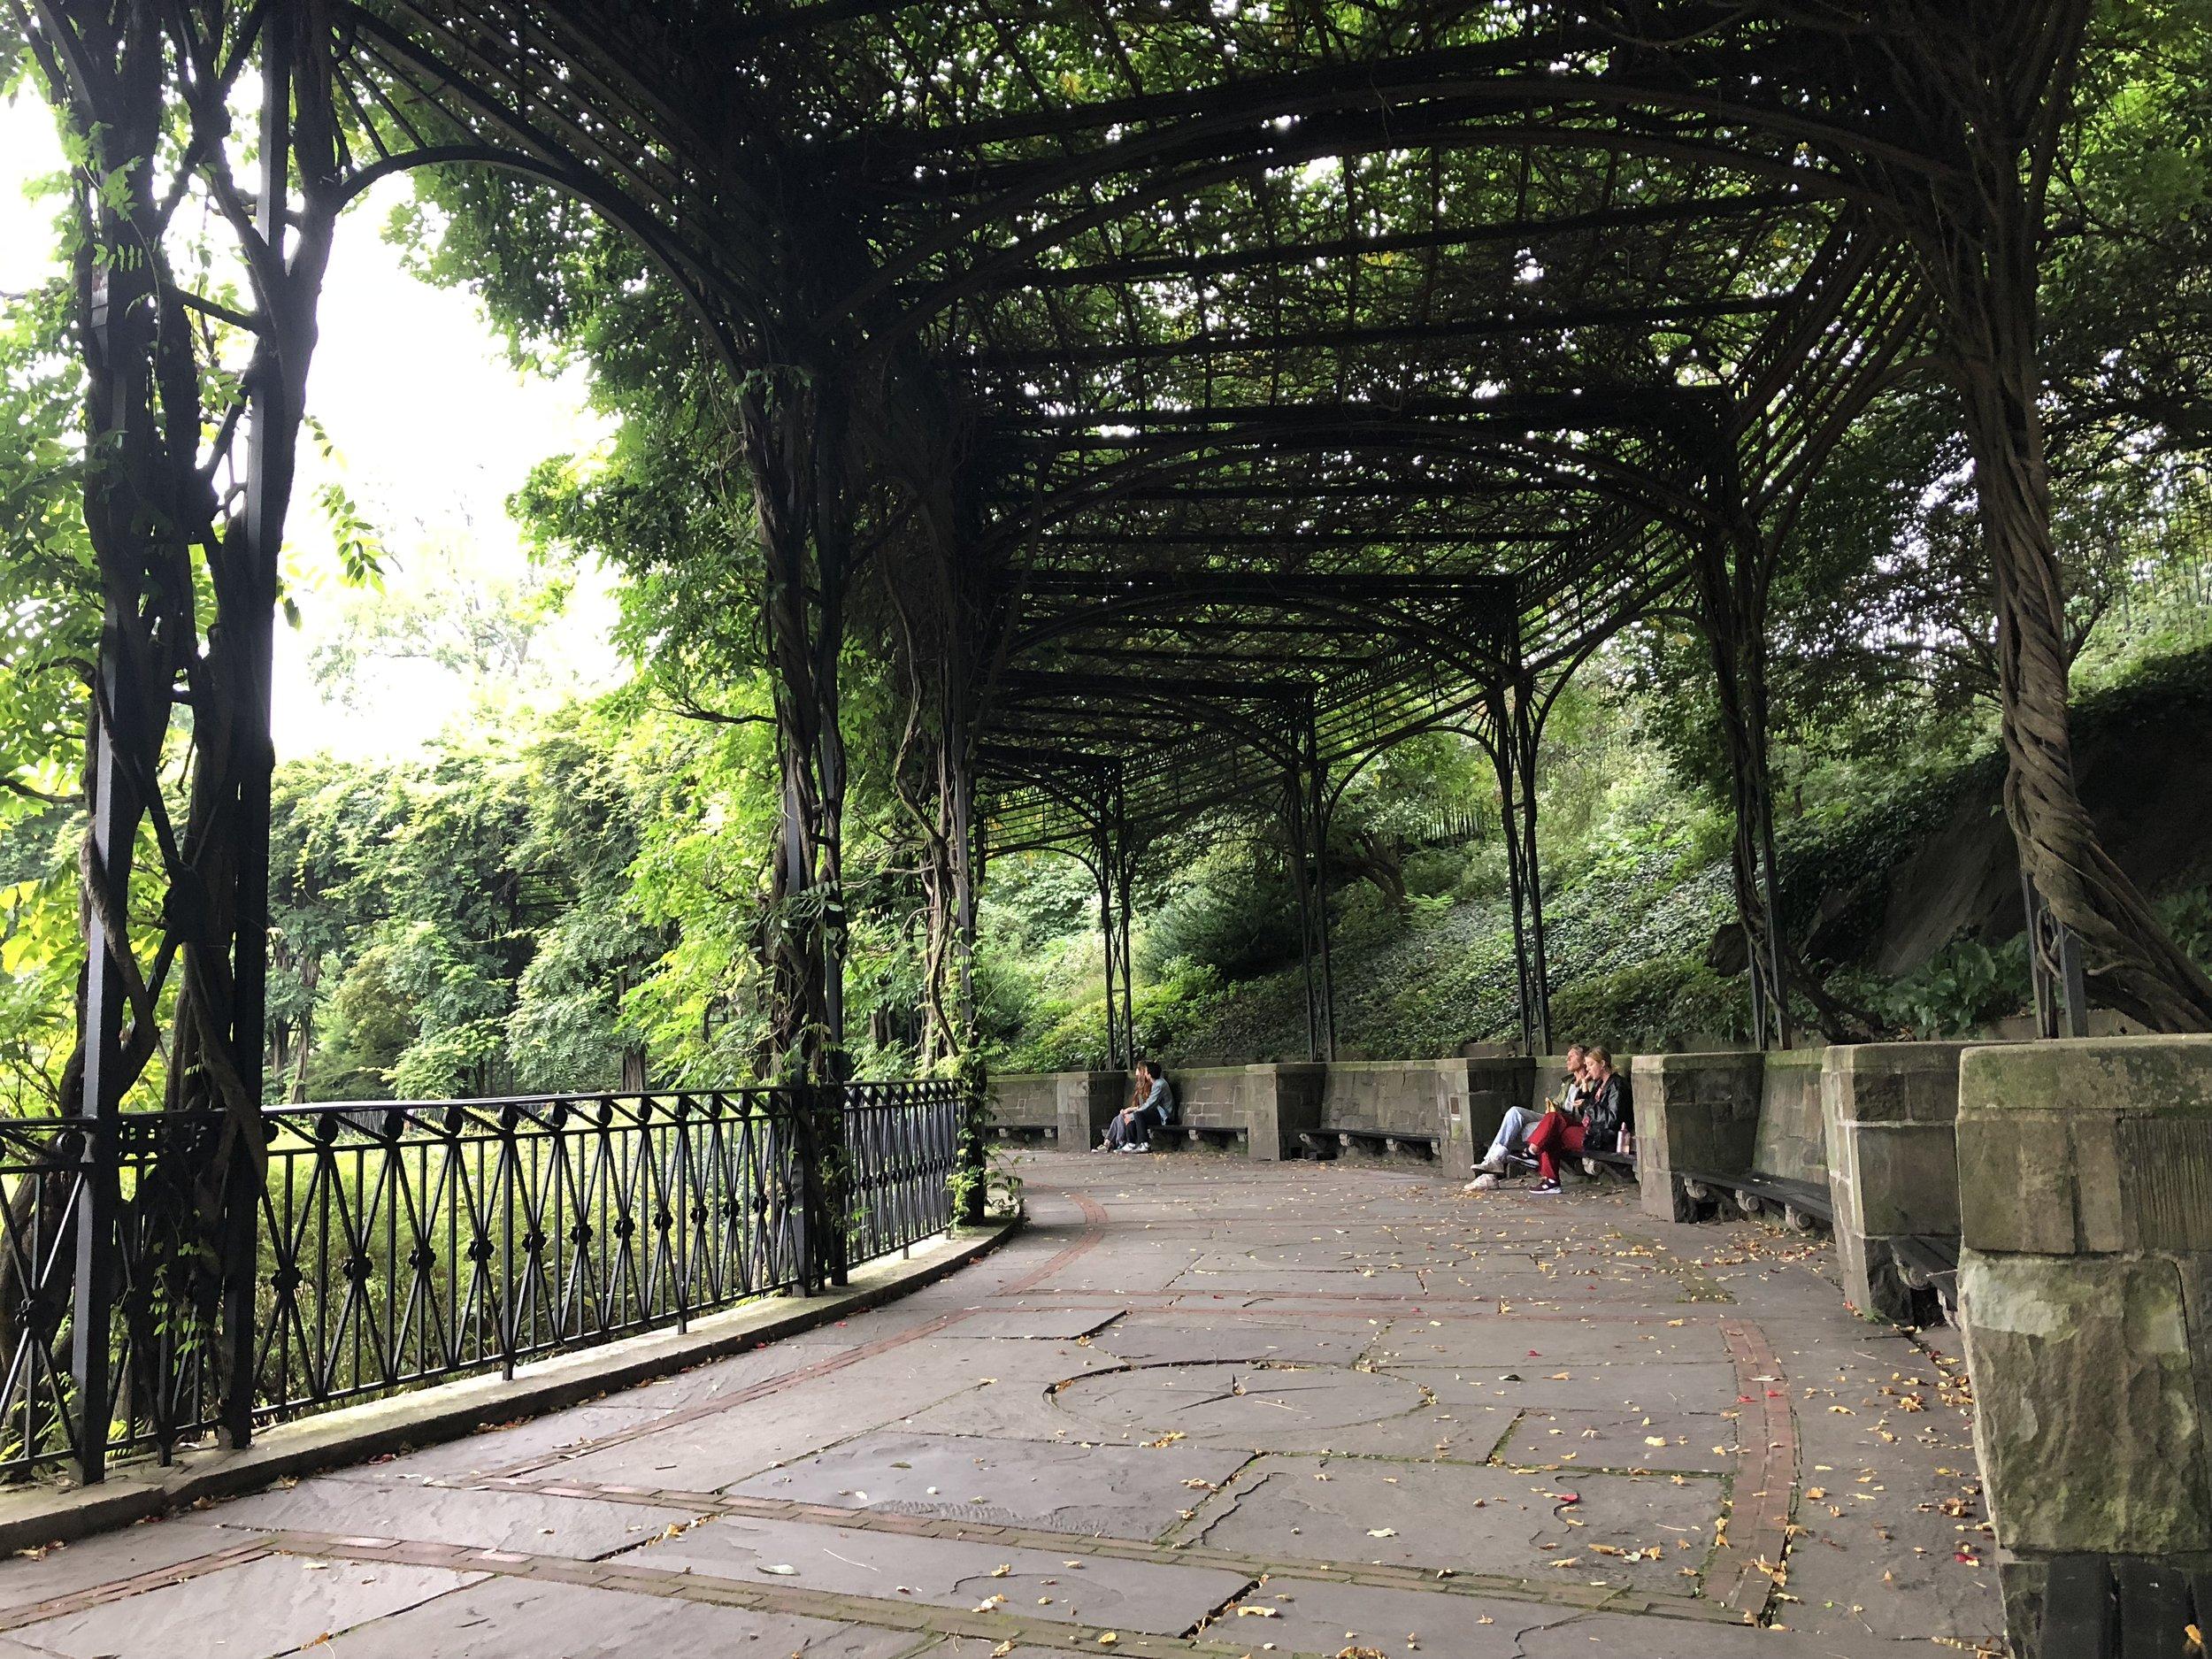 LFields_Central Park_Conservatory Garden central garden wisteria pergola.JPG